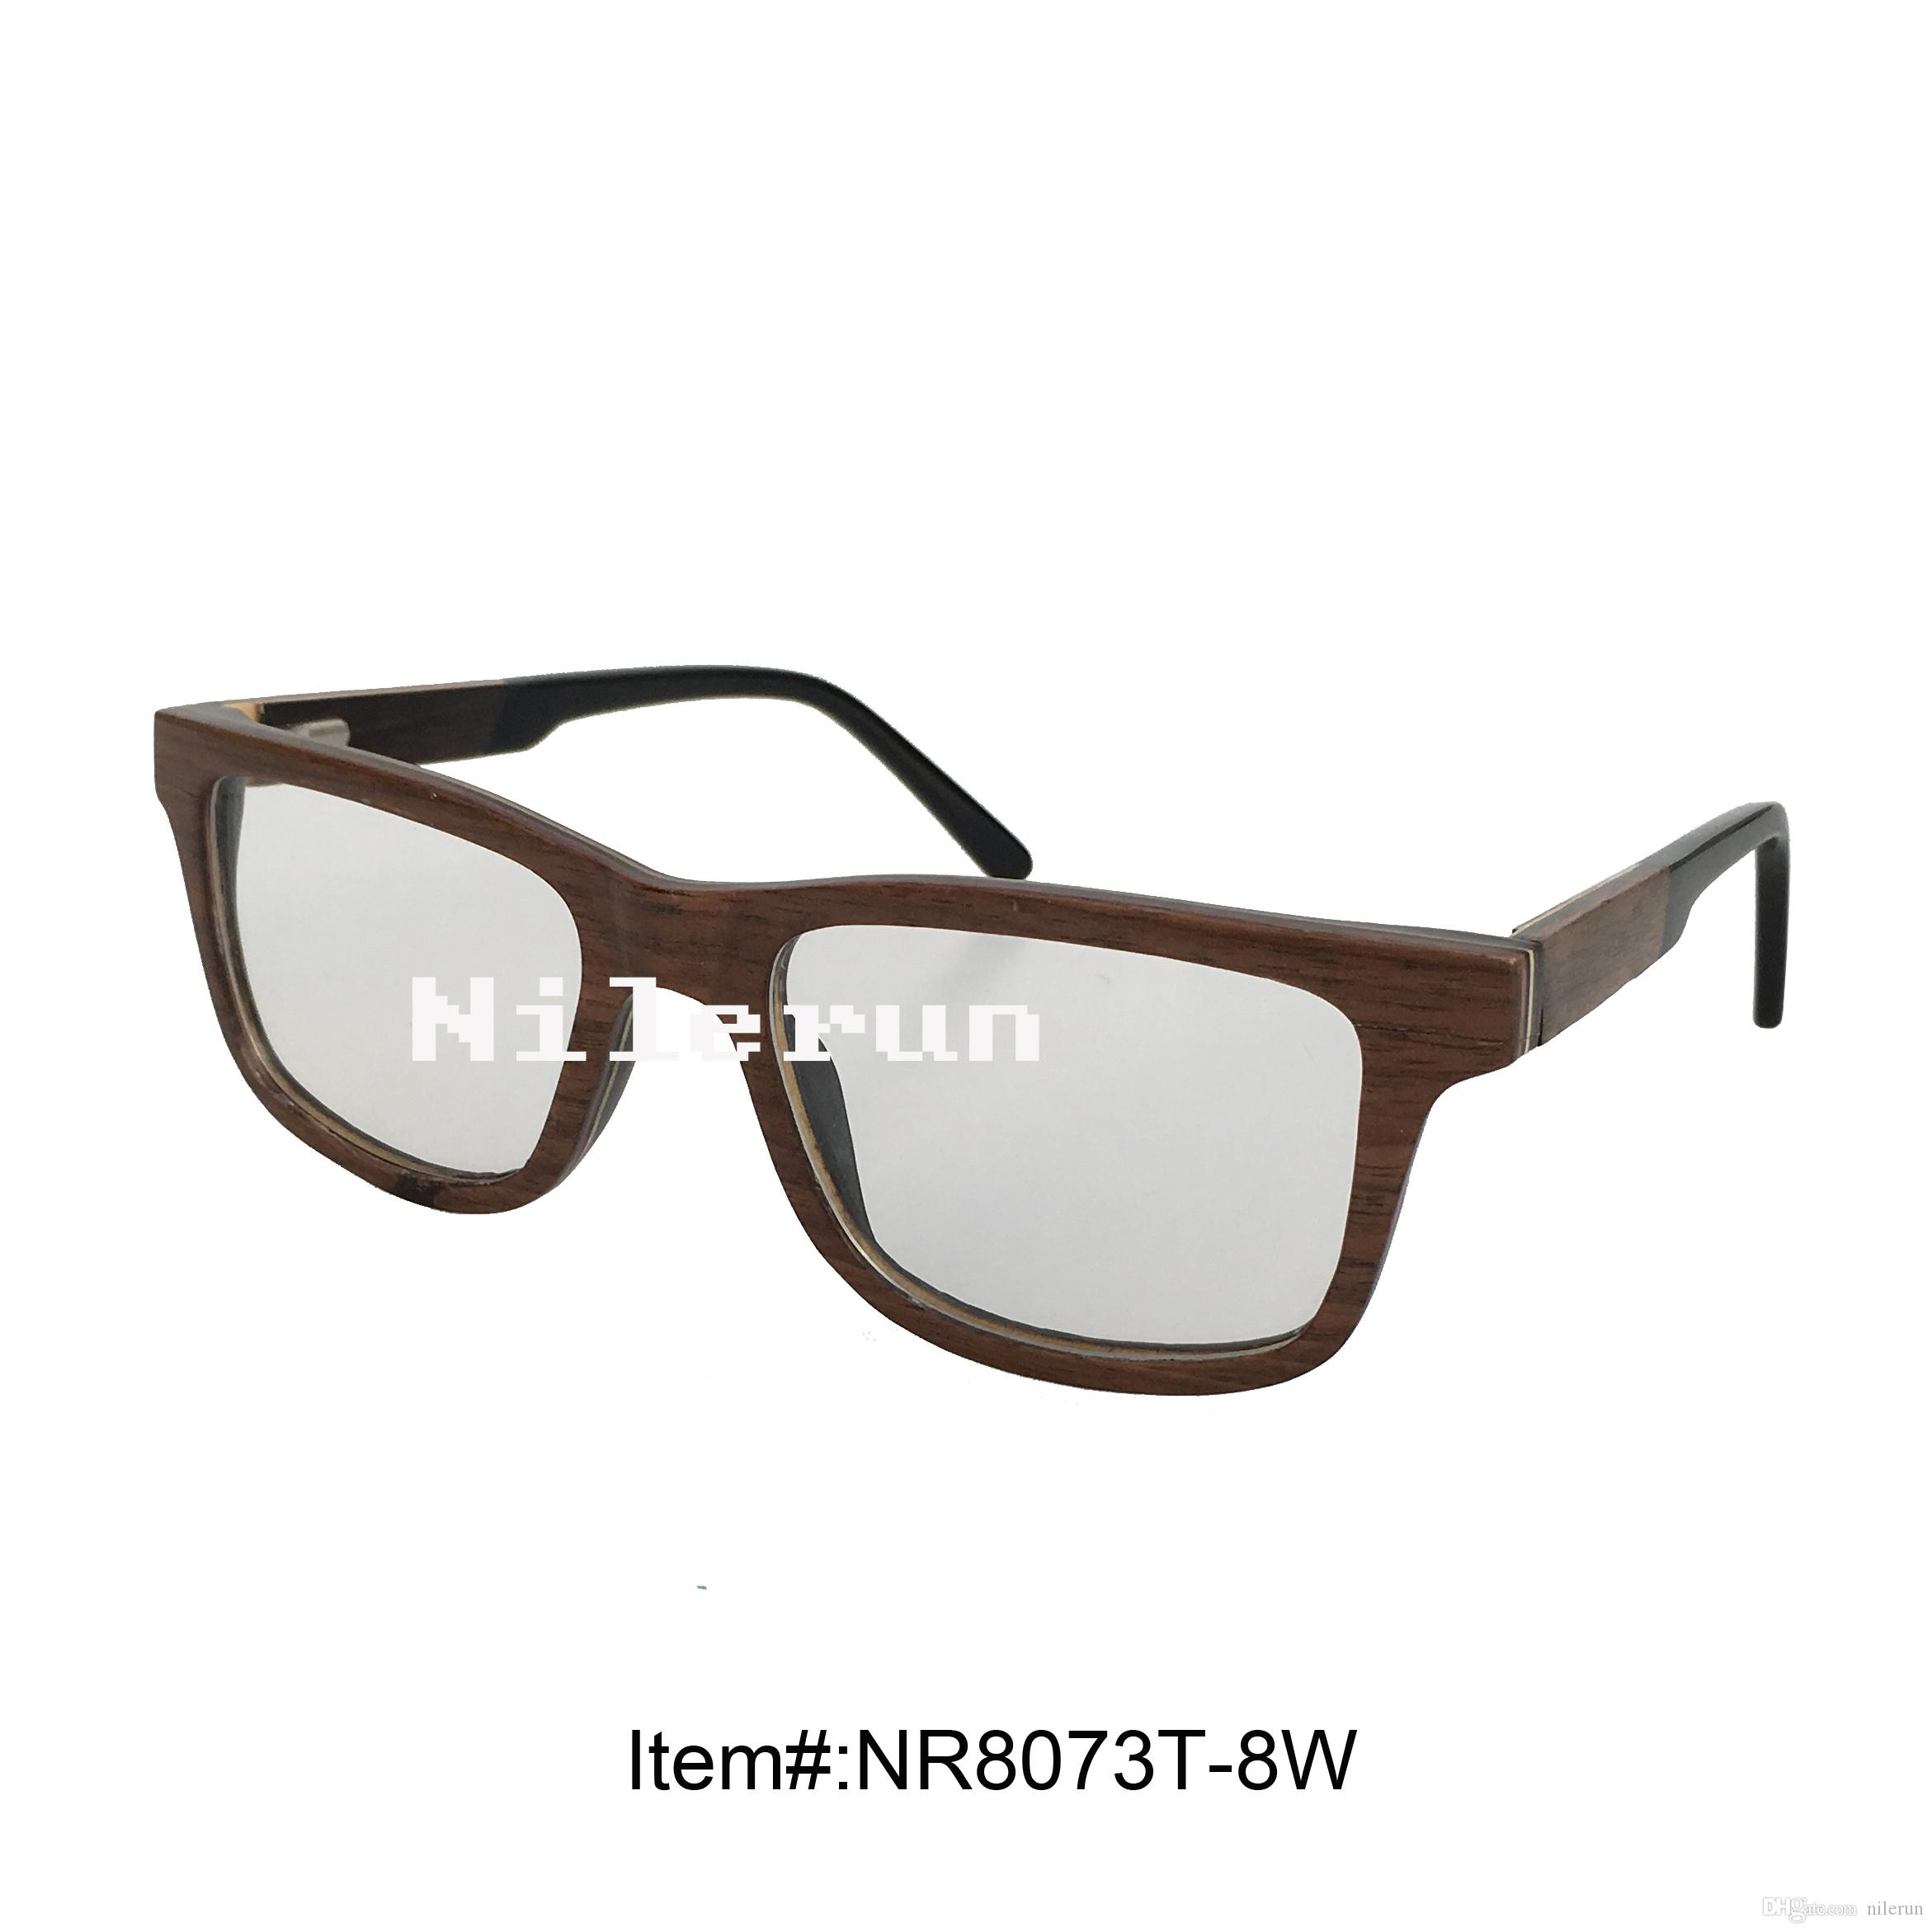 High Quality Layered Wood Frame Optical Reading Glasses Latest ...